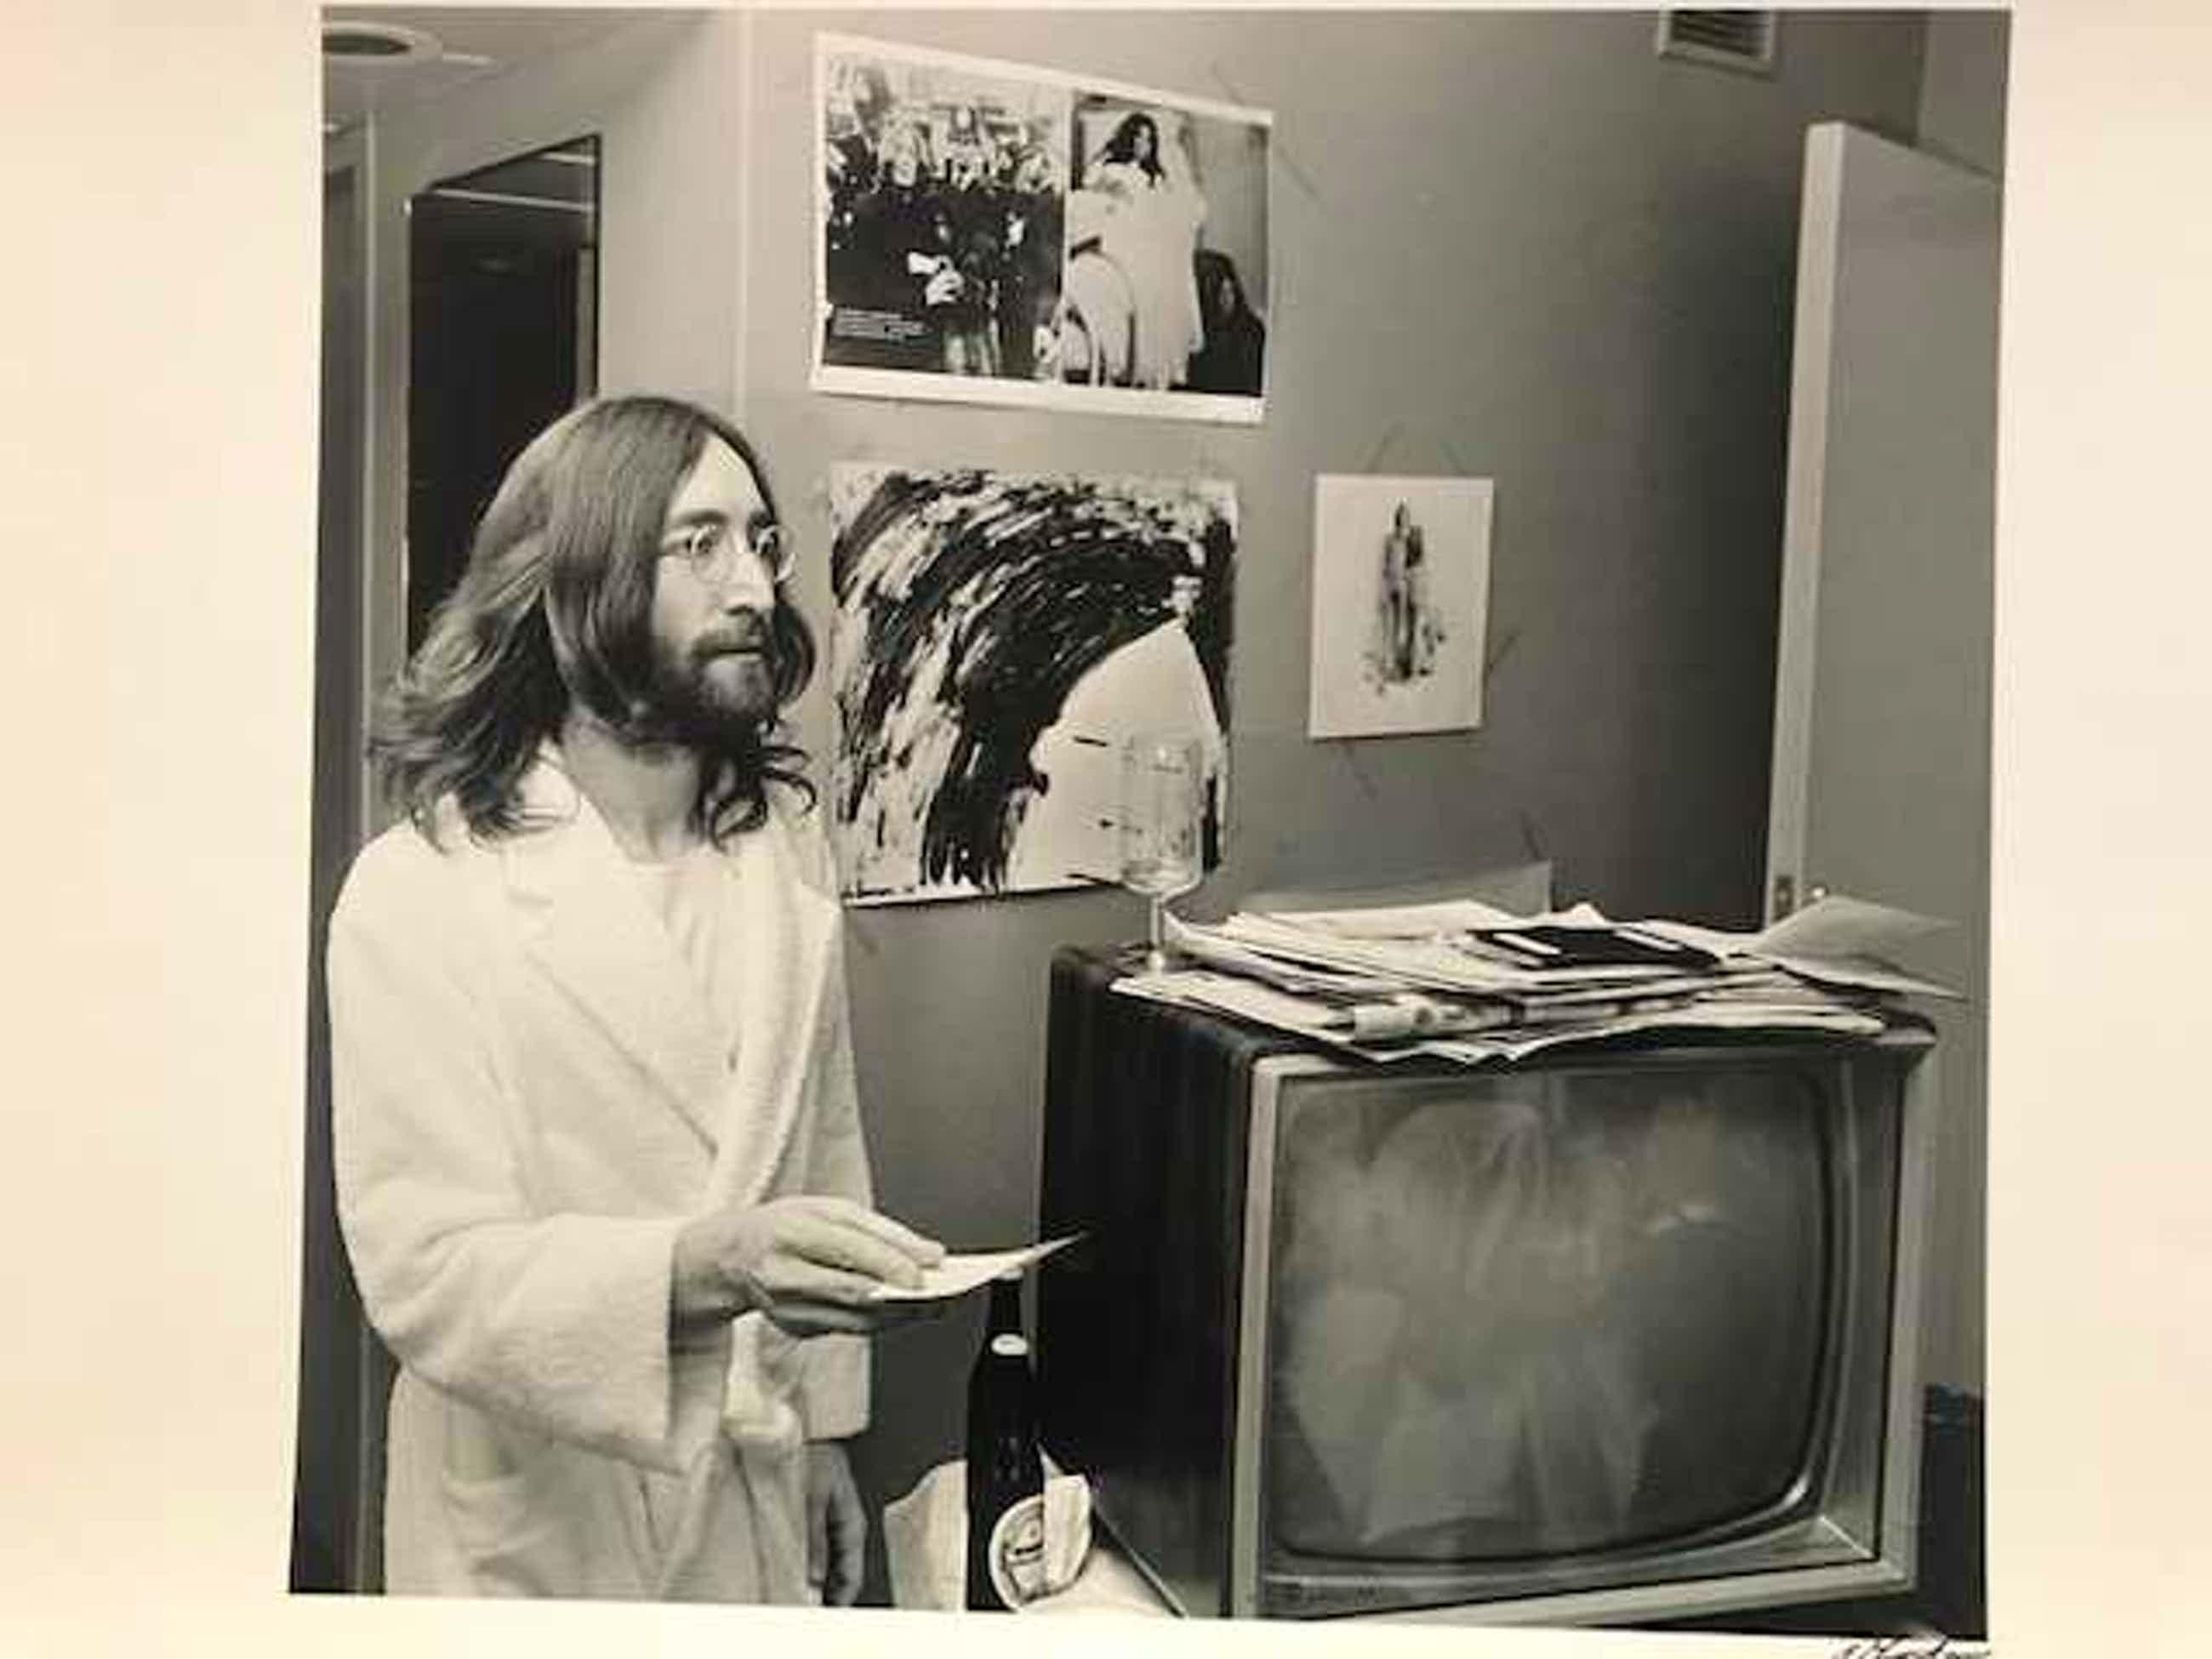 Nico Koster - John Lennon Yoko Ono Hilton Amsterdam 1969 kopen? Bied vanaf 100!